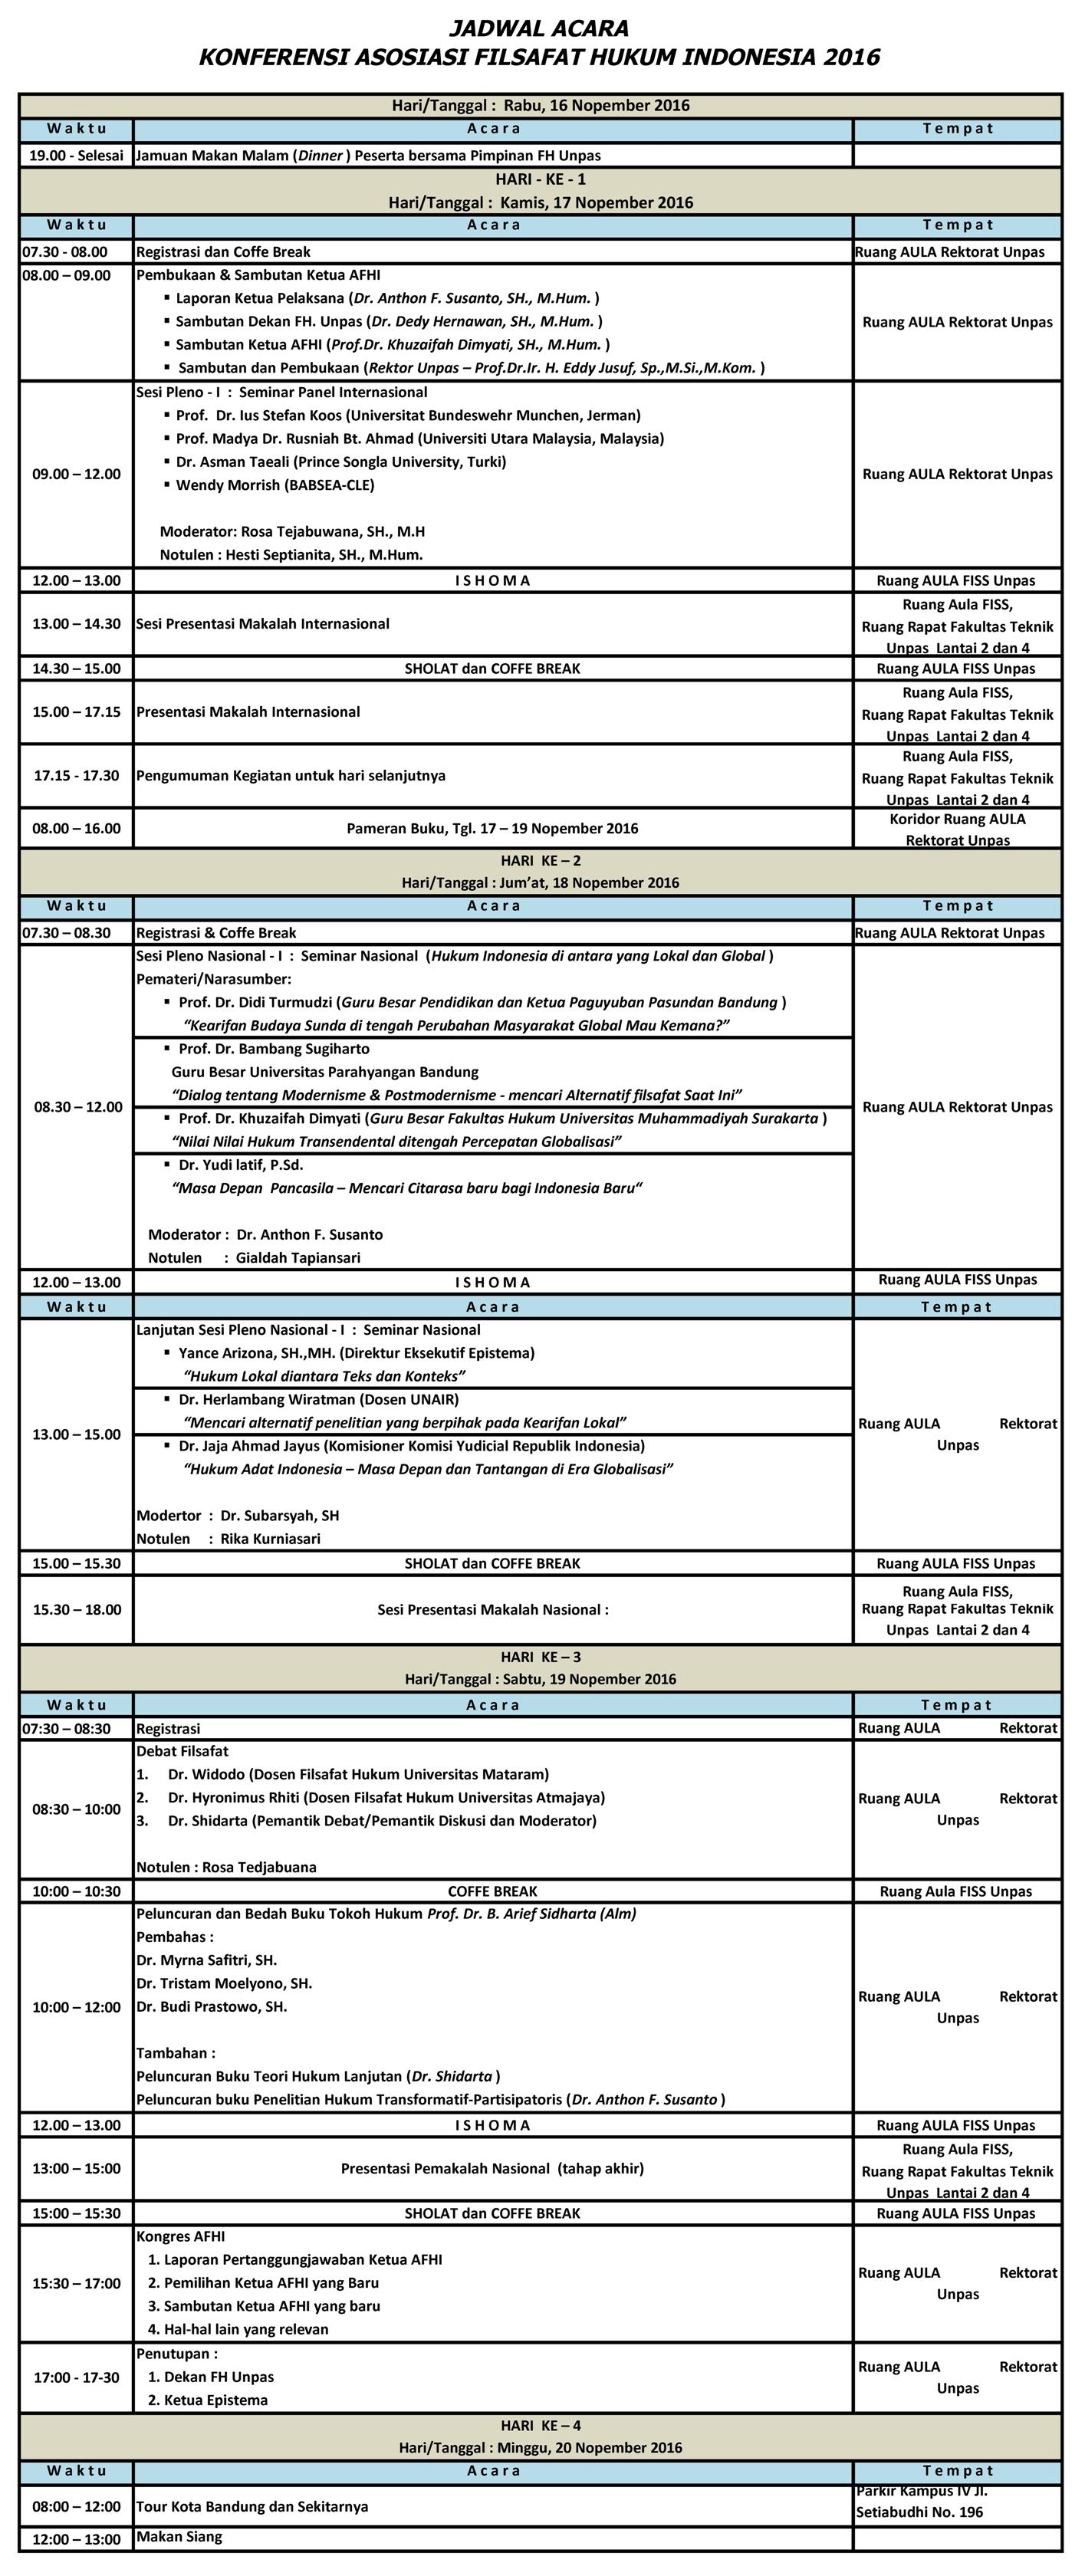 Jadwal Acara Konferensi AFHI ke-6